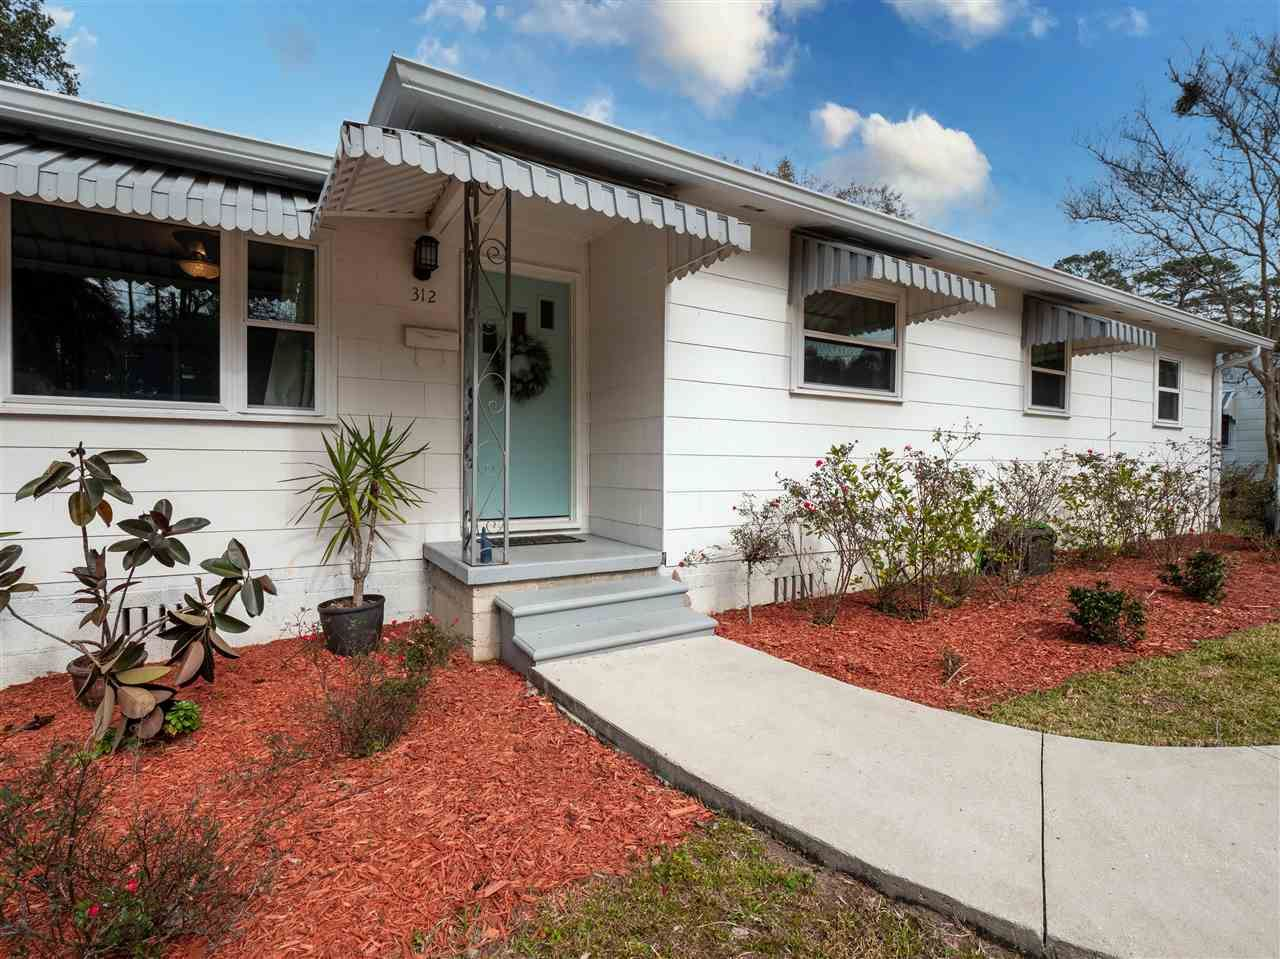 312 N Dellview Dr, Tallahassee, FL 32303 - MLS#: 312920